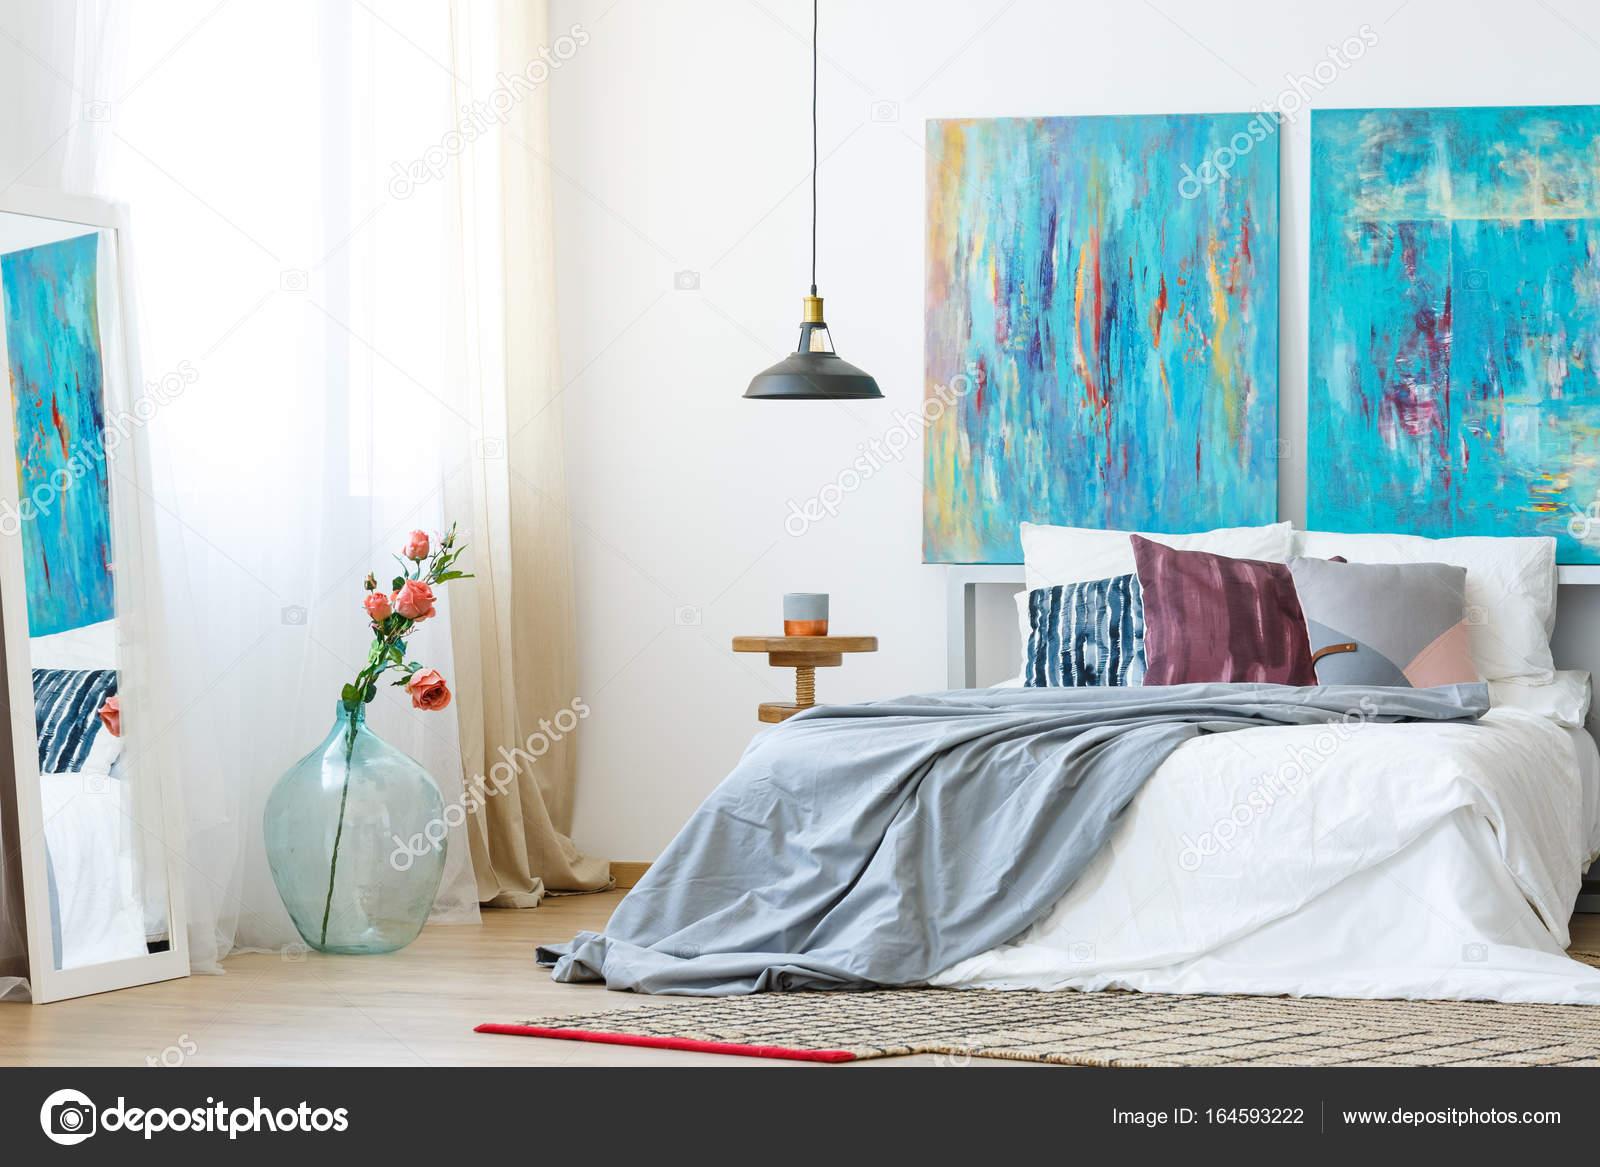 Camera da letto con Diy dipinto cuscini — Foto Stock © photographee ...